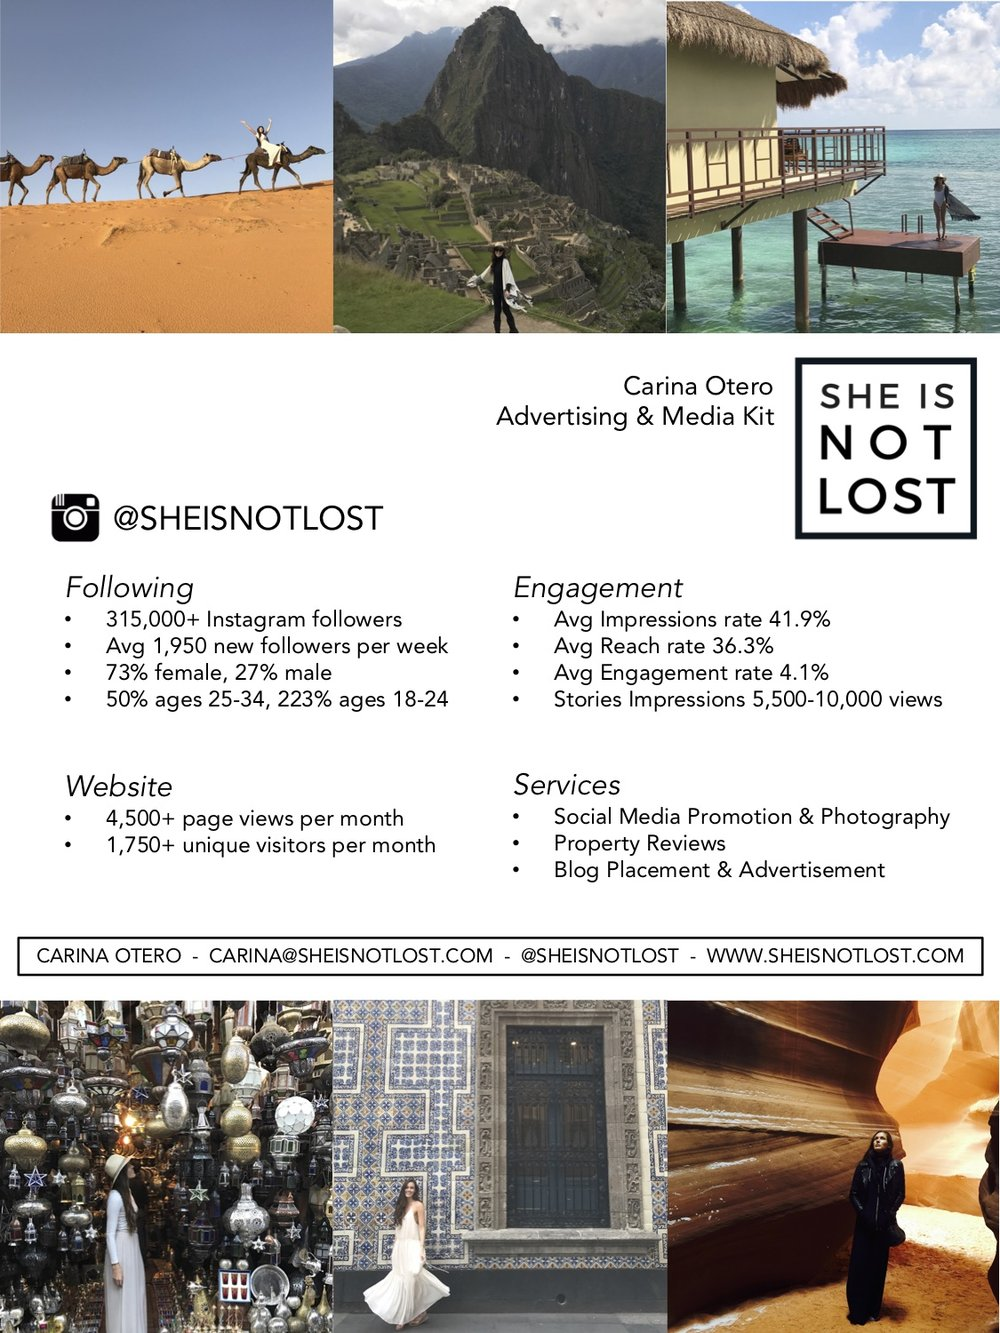 SHEISNOTLOST Media Kit 012019.jpg